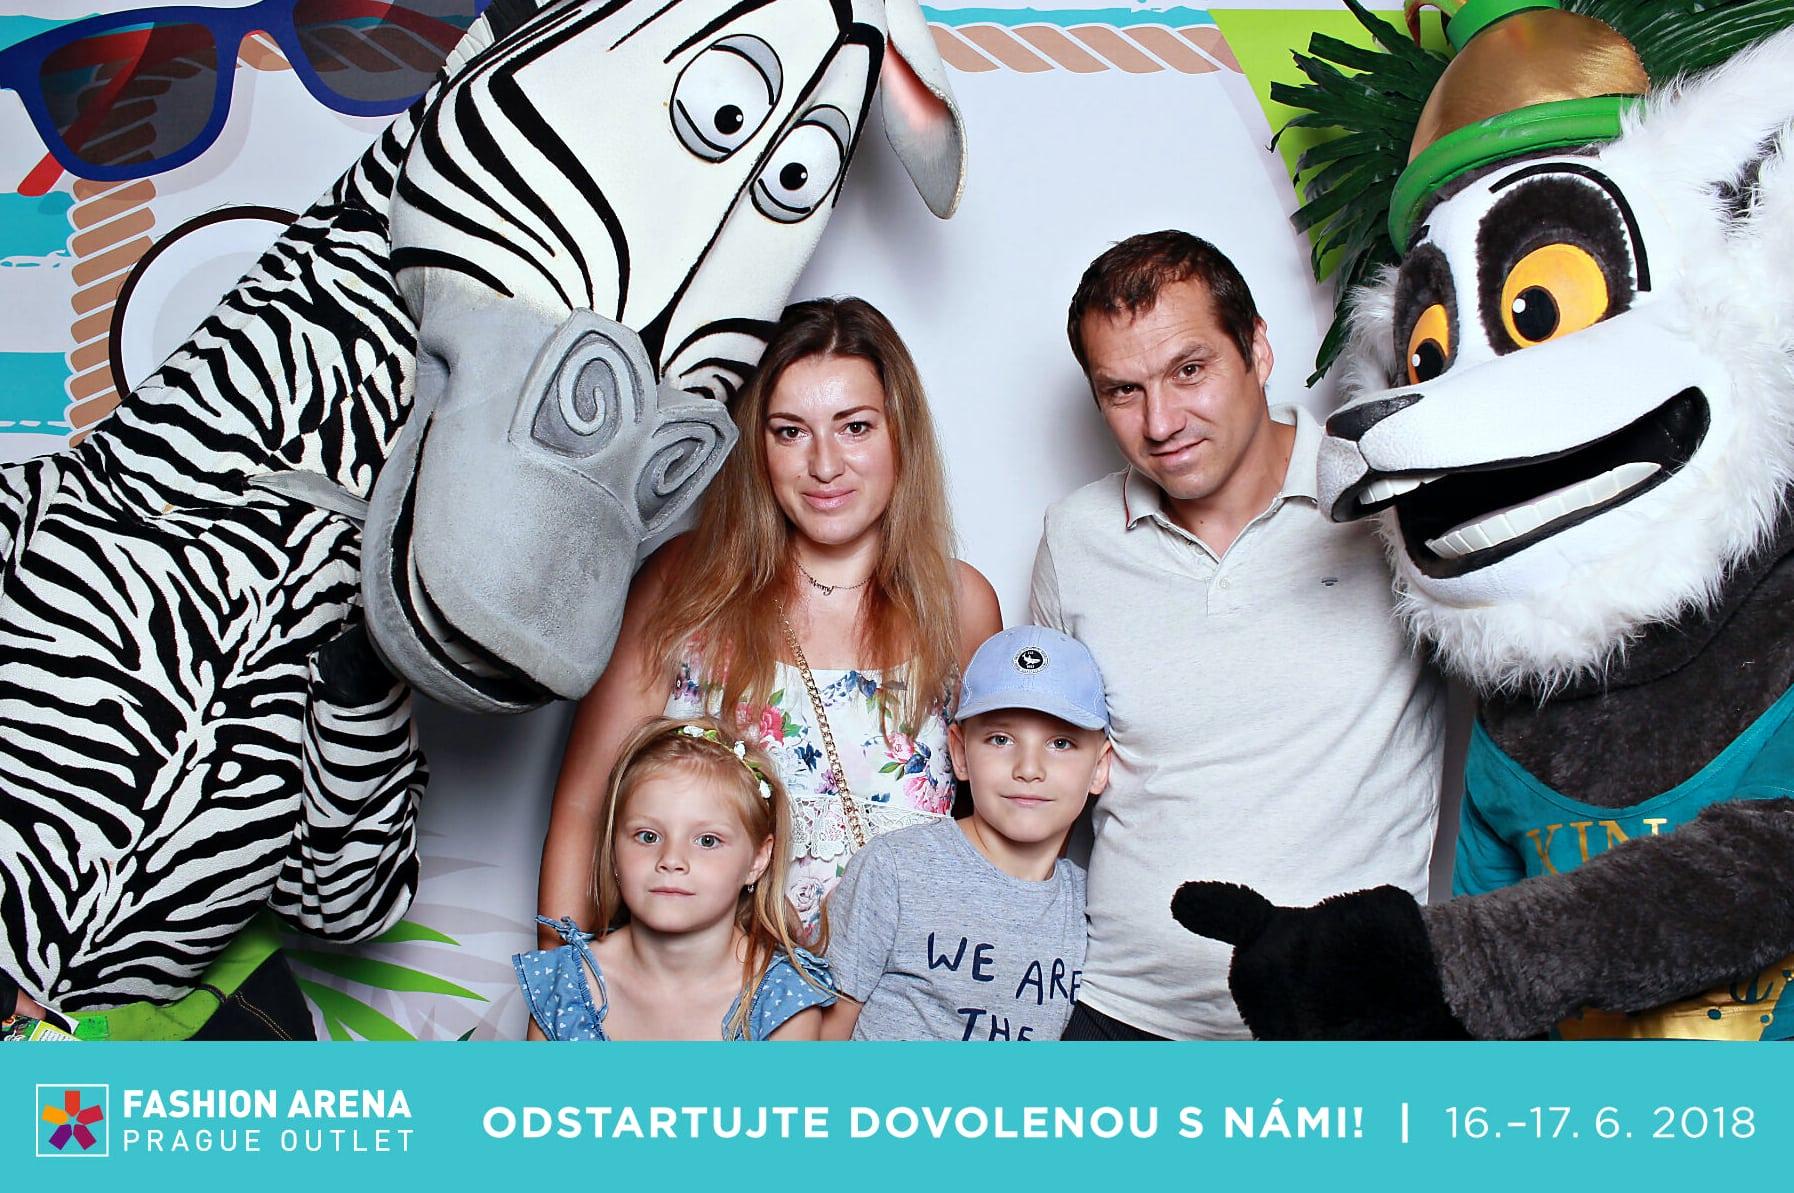 fotokoutek-fashion-arena-odstartujte-sezonu-s-nami-16-6-2018-440432